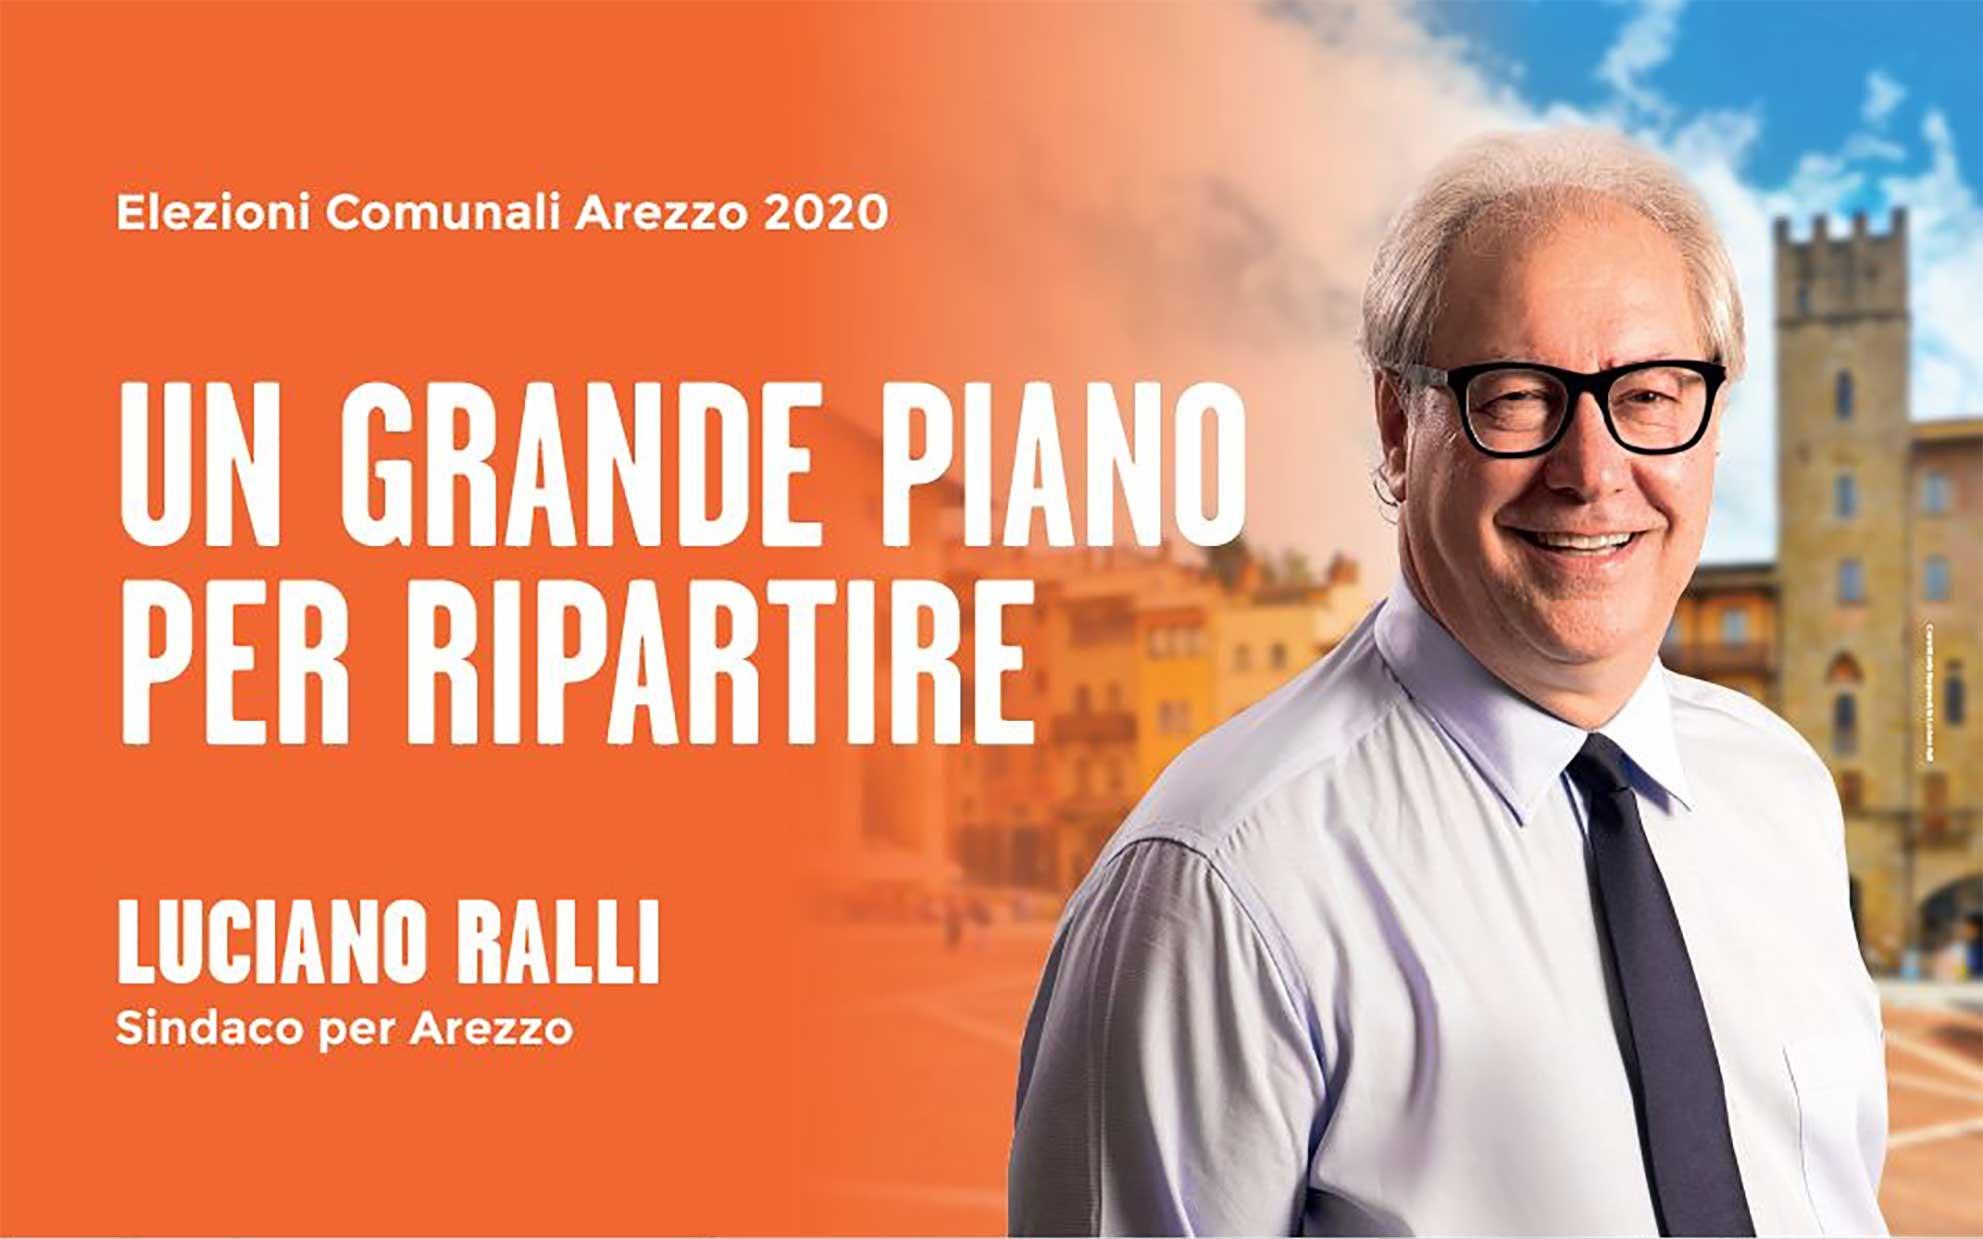 LucianoRalli